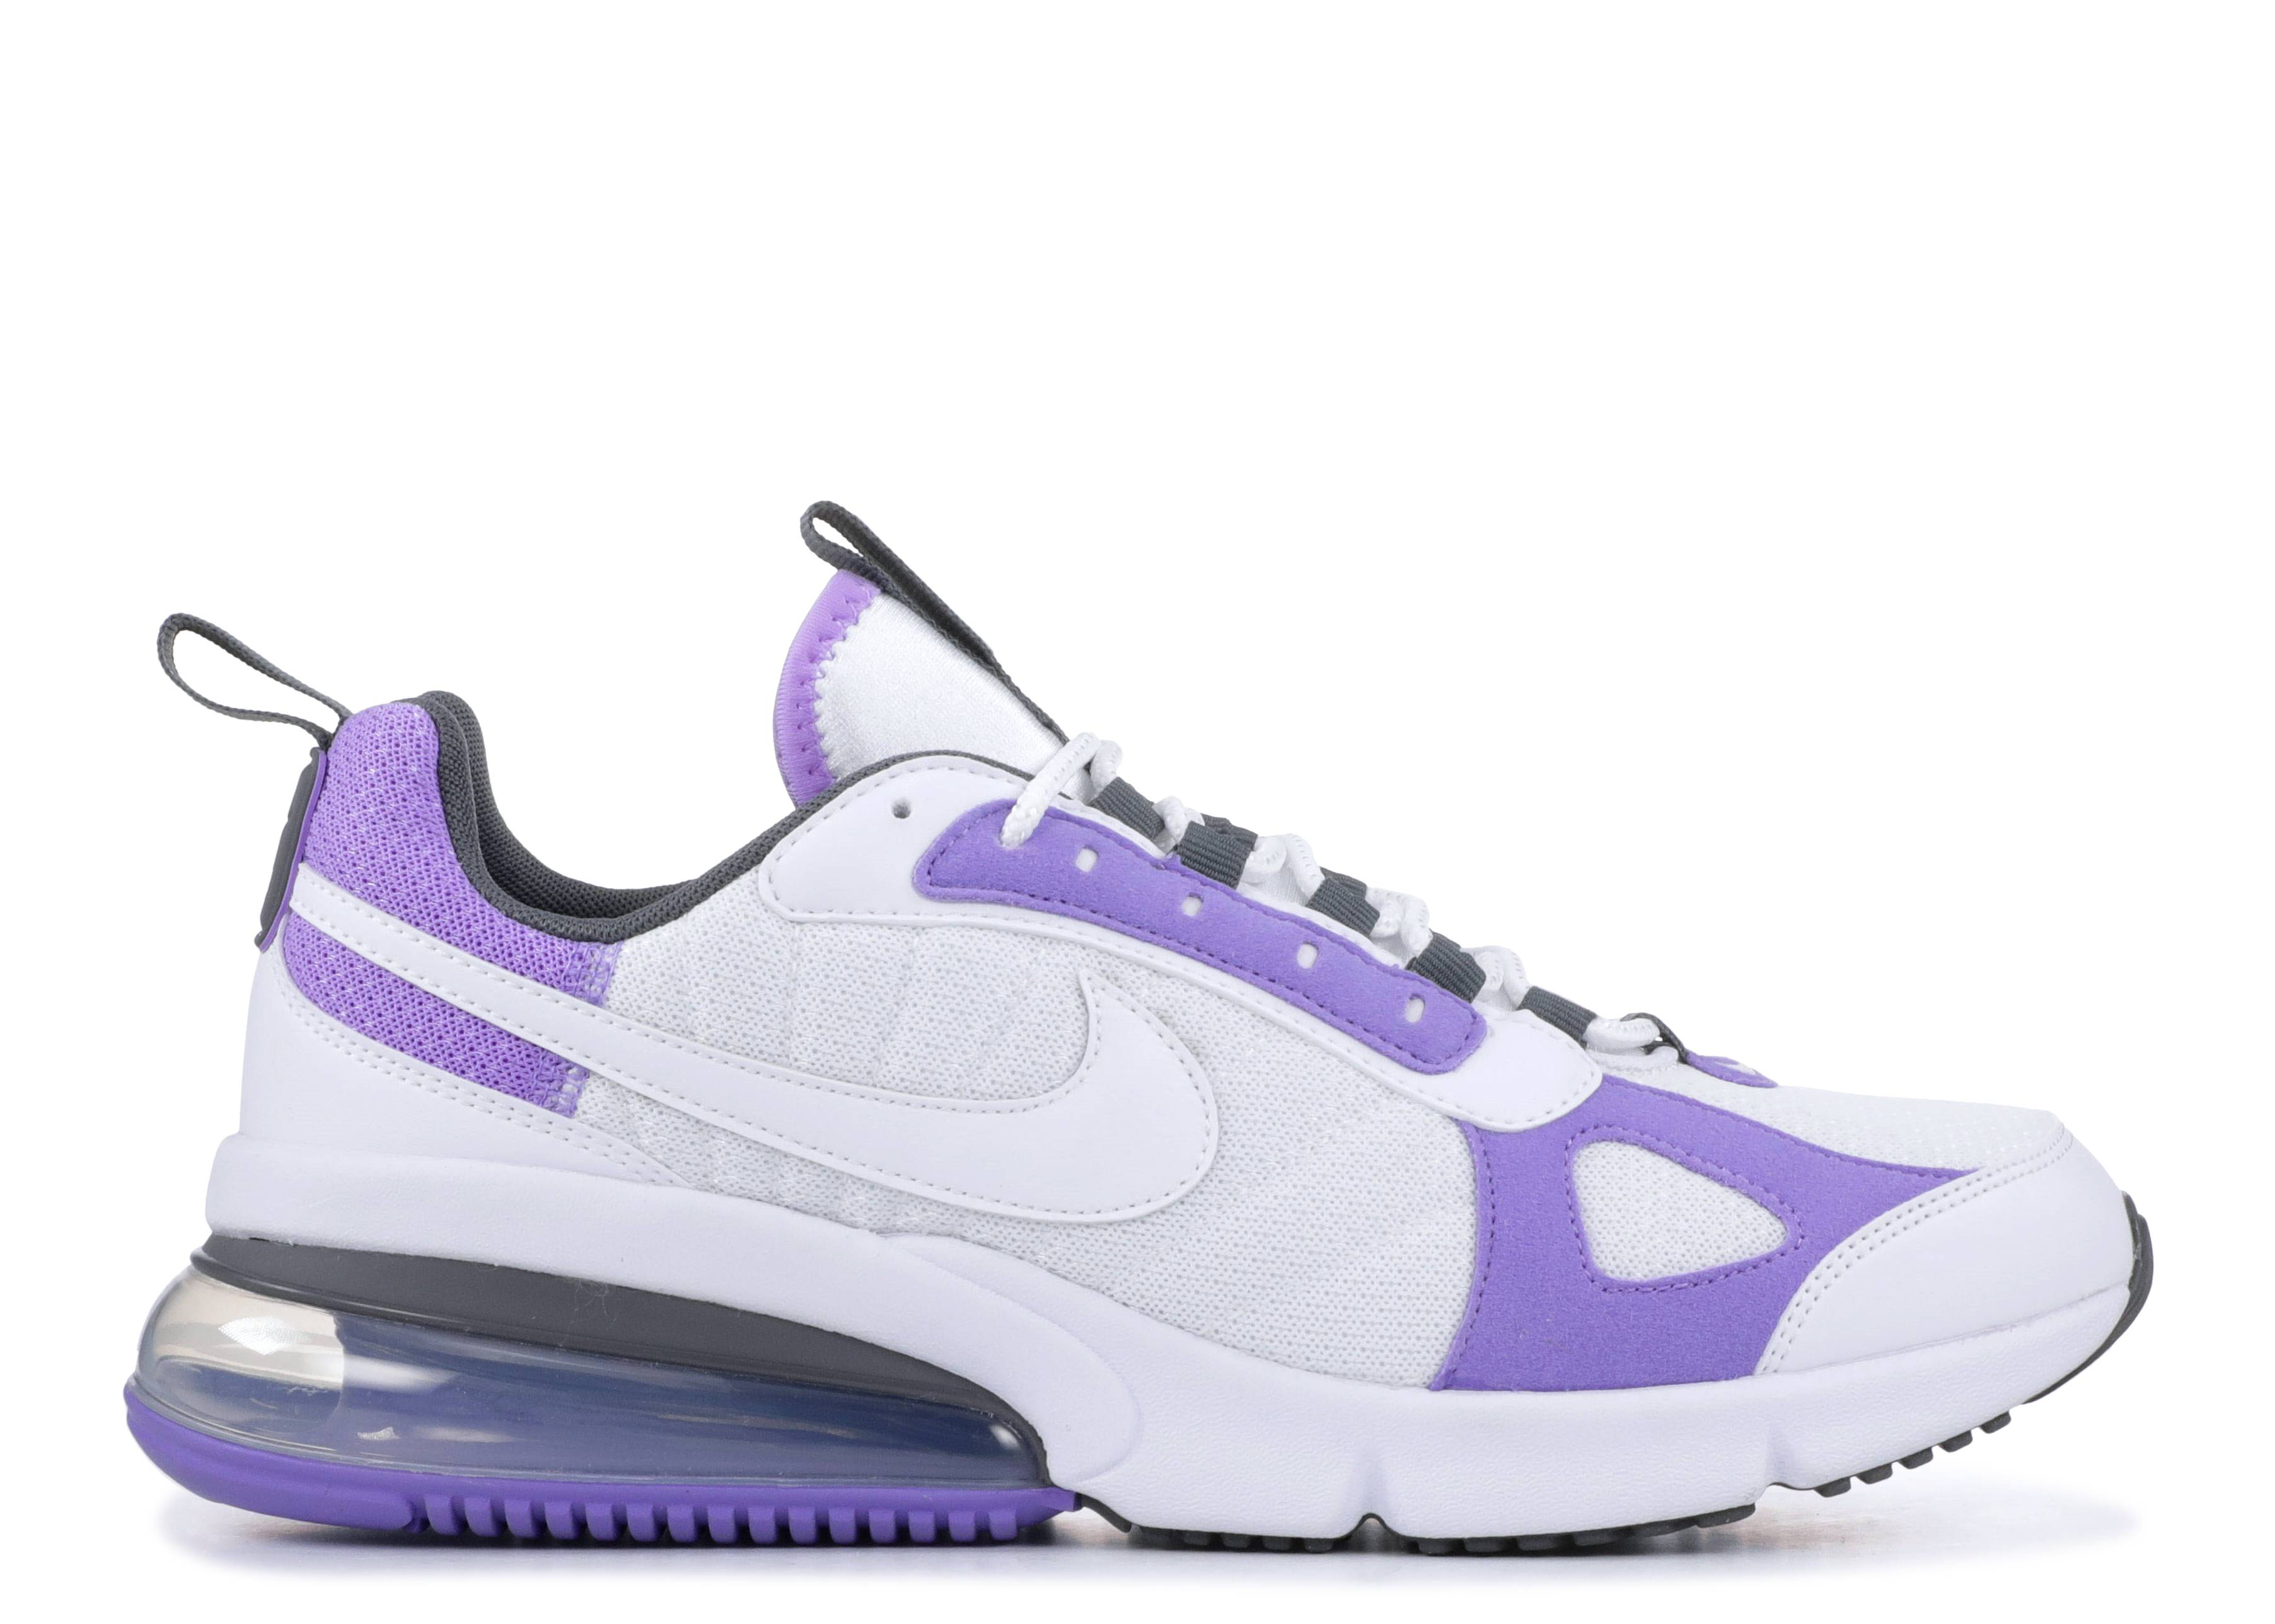 270 air max violet